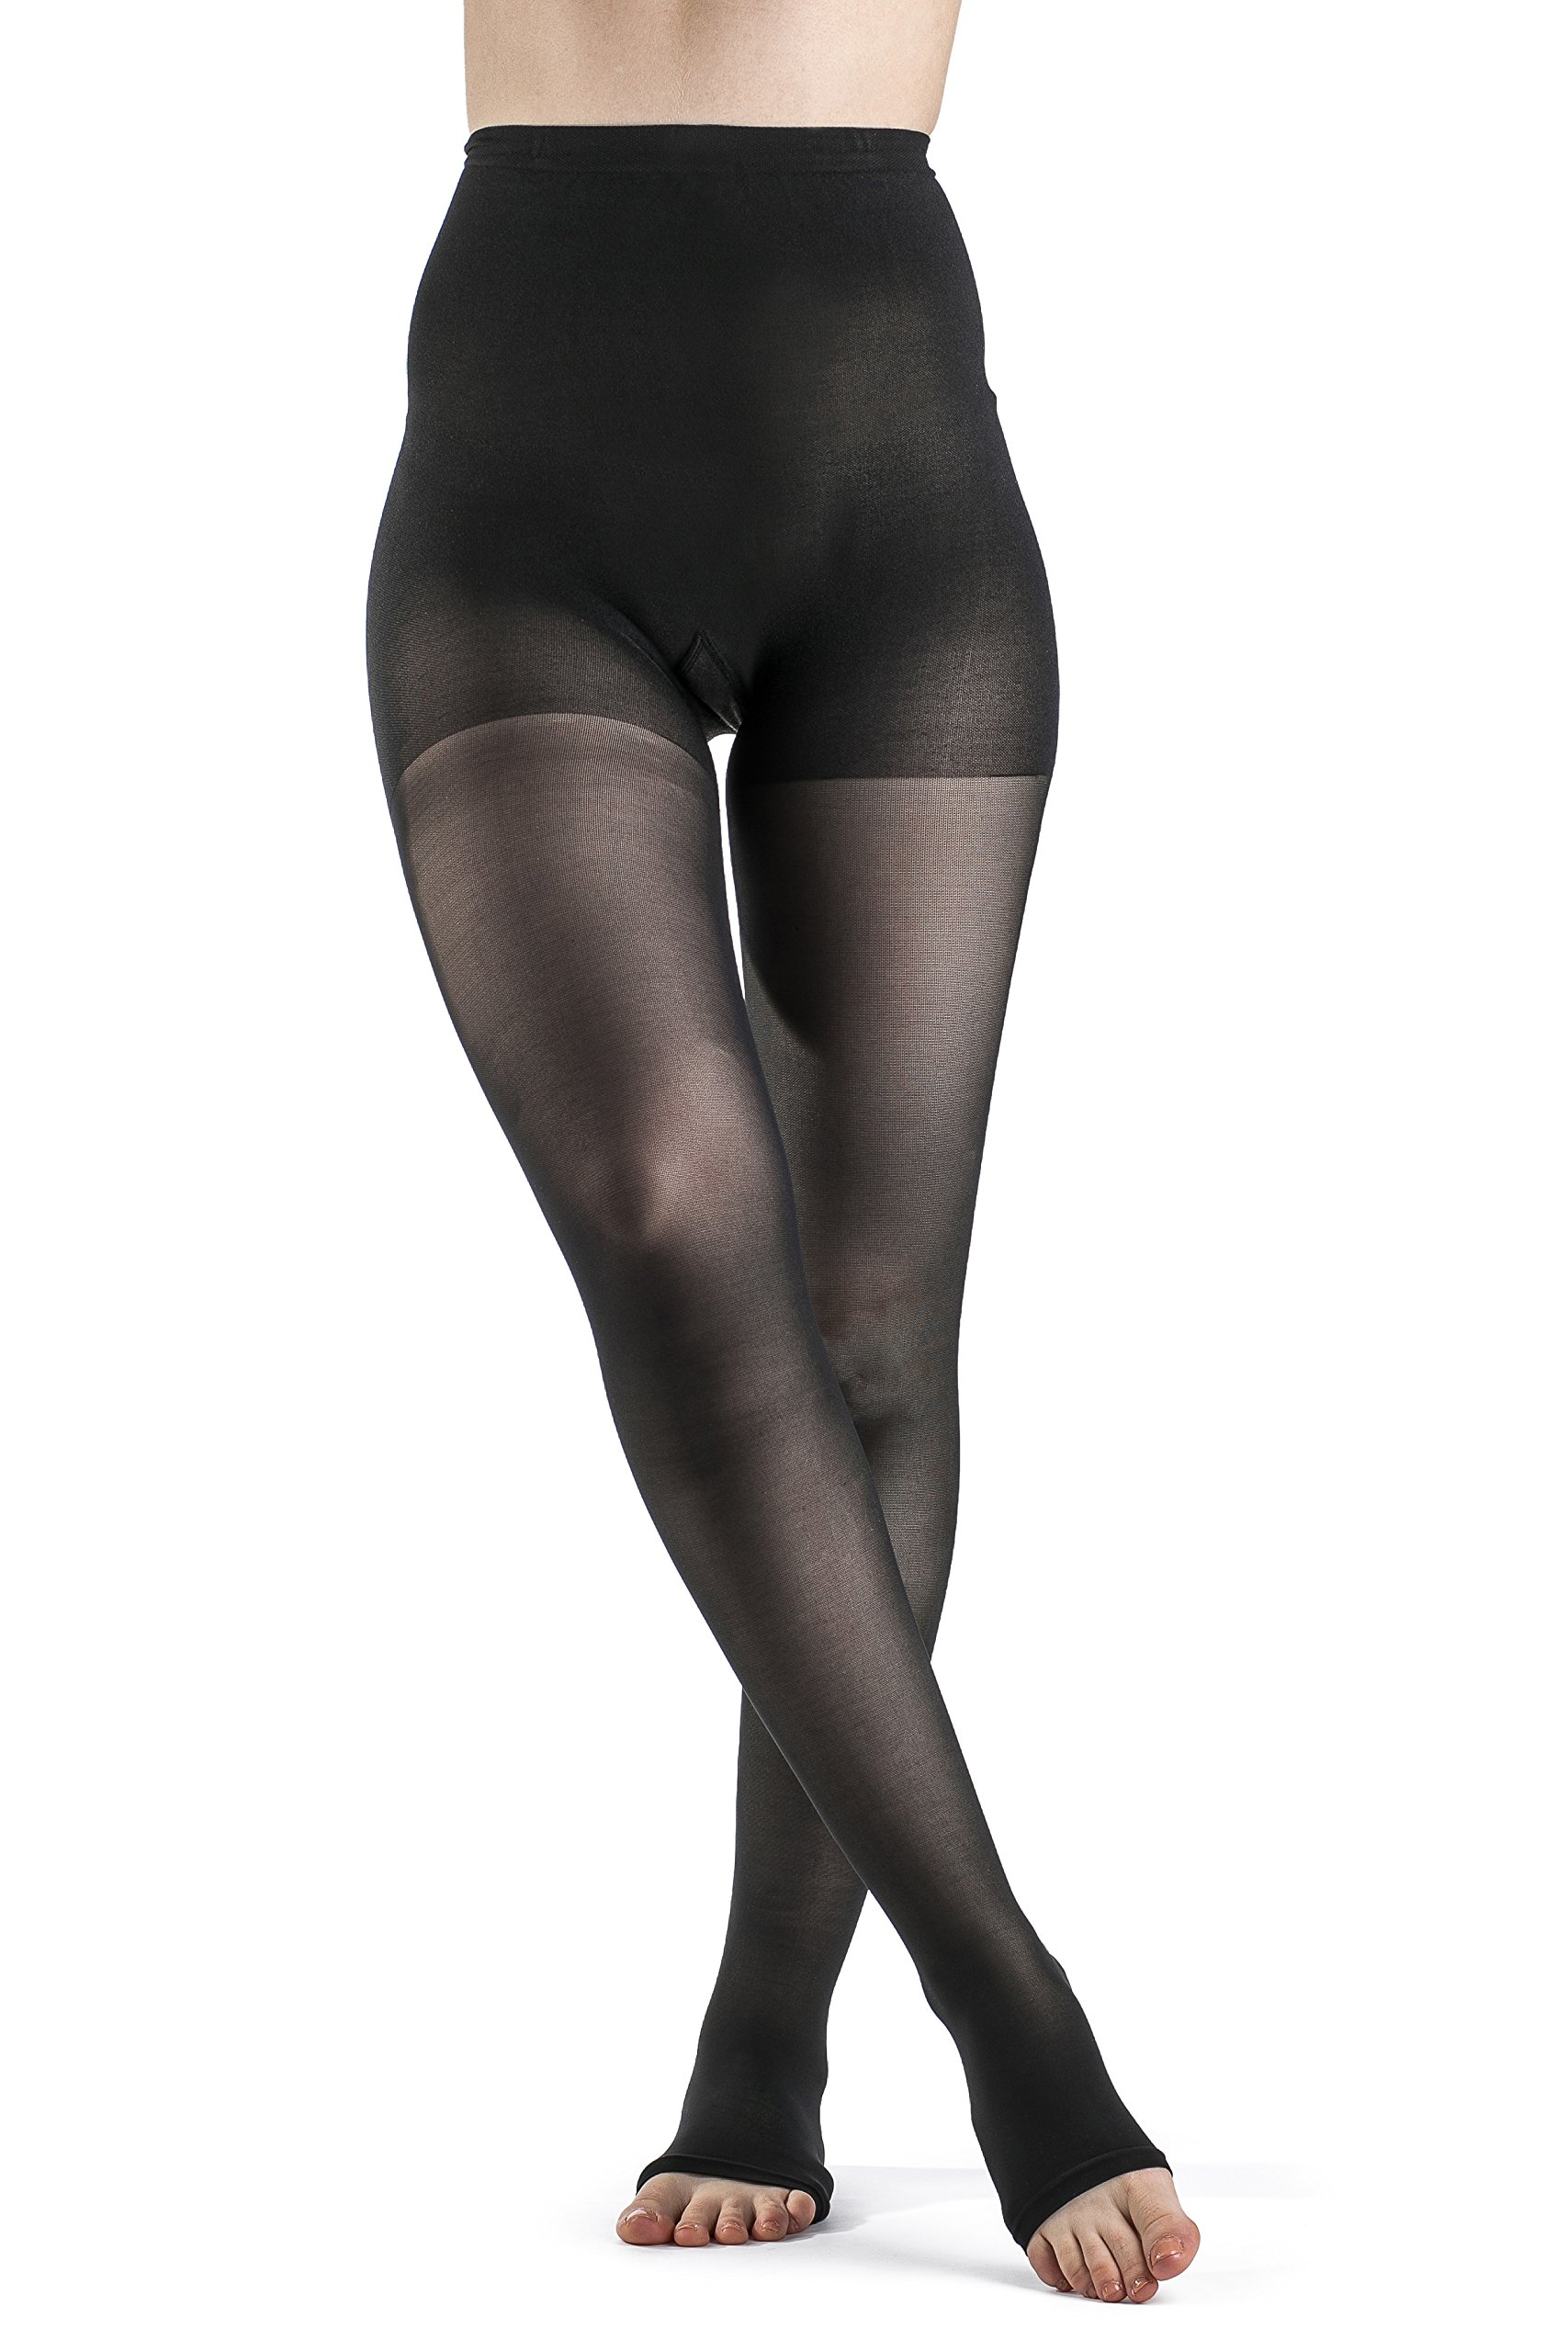 SIGVARIS Women's EVERSHEER 780 Open Toe Compression Pantyhose 20-30mmHg